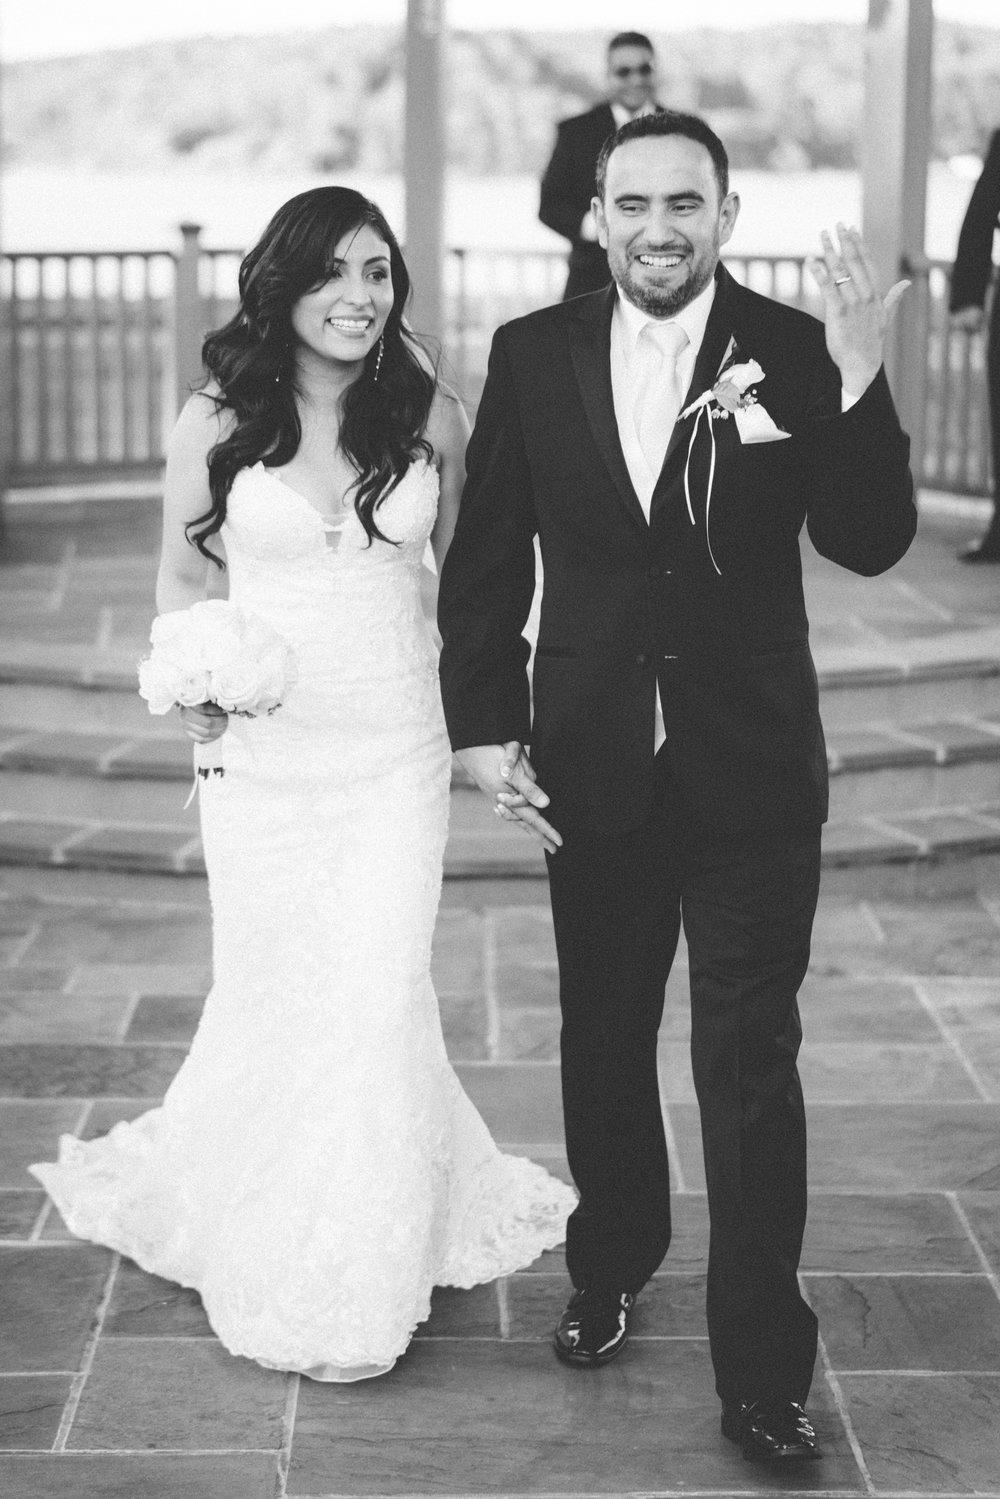 Mike_Steinmetz_Virginia_Wedding_Photographer_Favorites-27.jpg